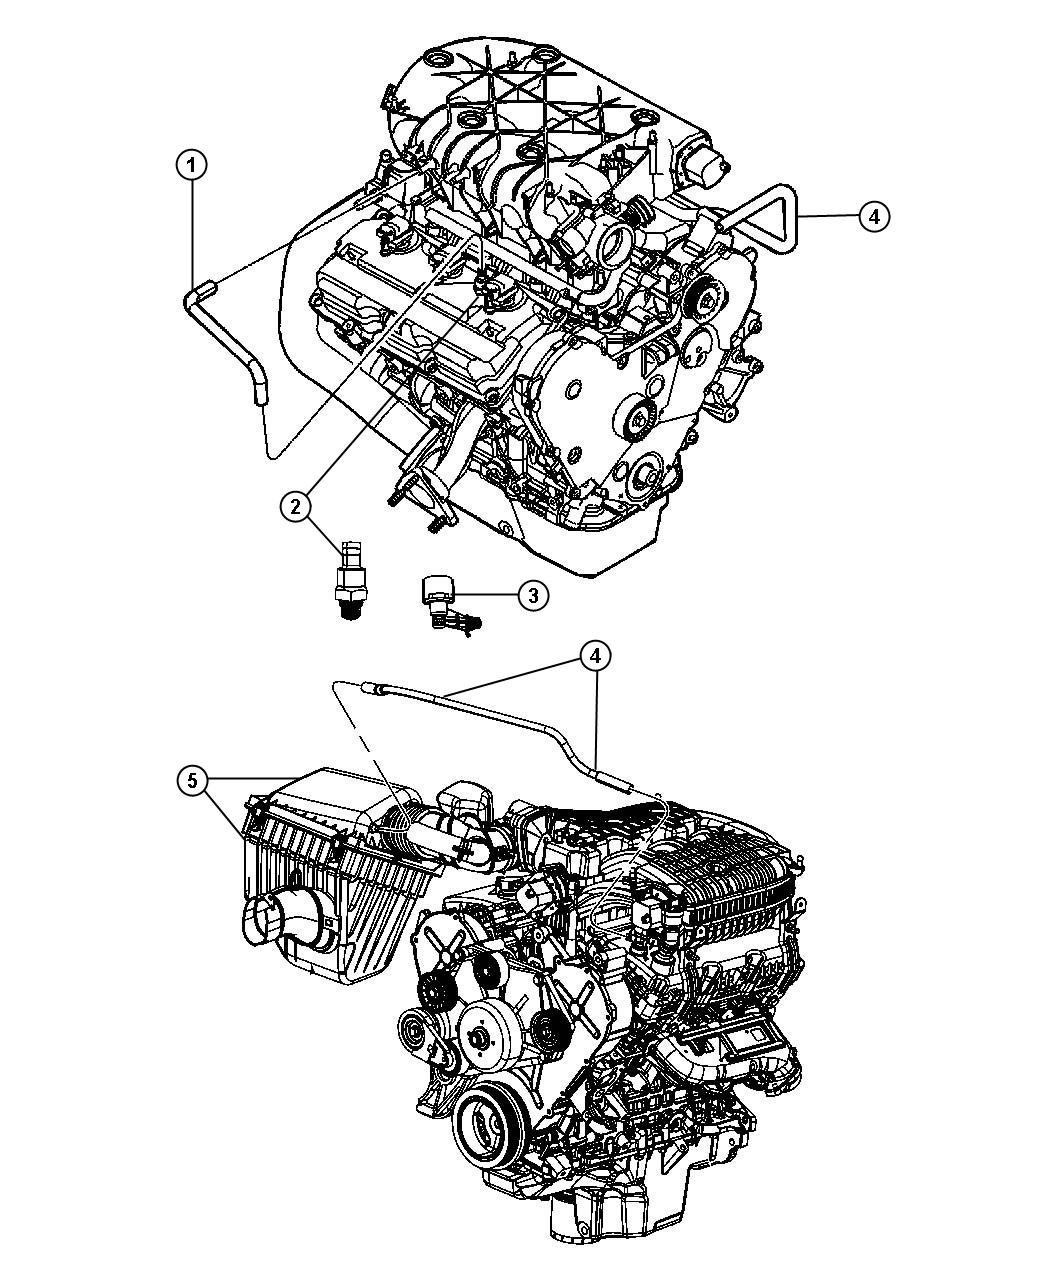 2011 dodge nitro fuse diagram r/t 4.0 pcv valve help | dodge nitro forum 2011 dodge nitro engine diagram